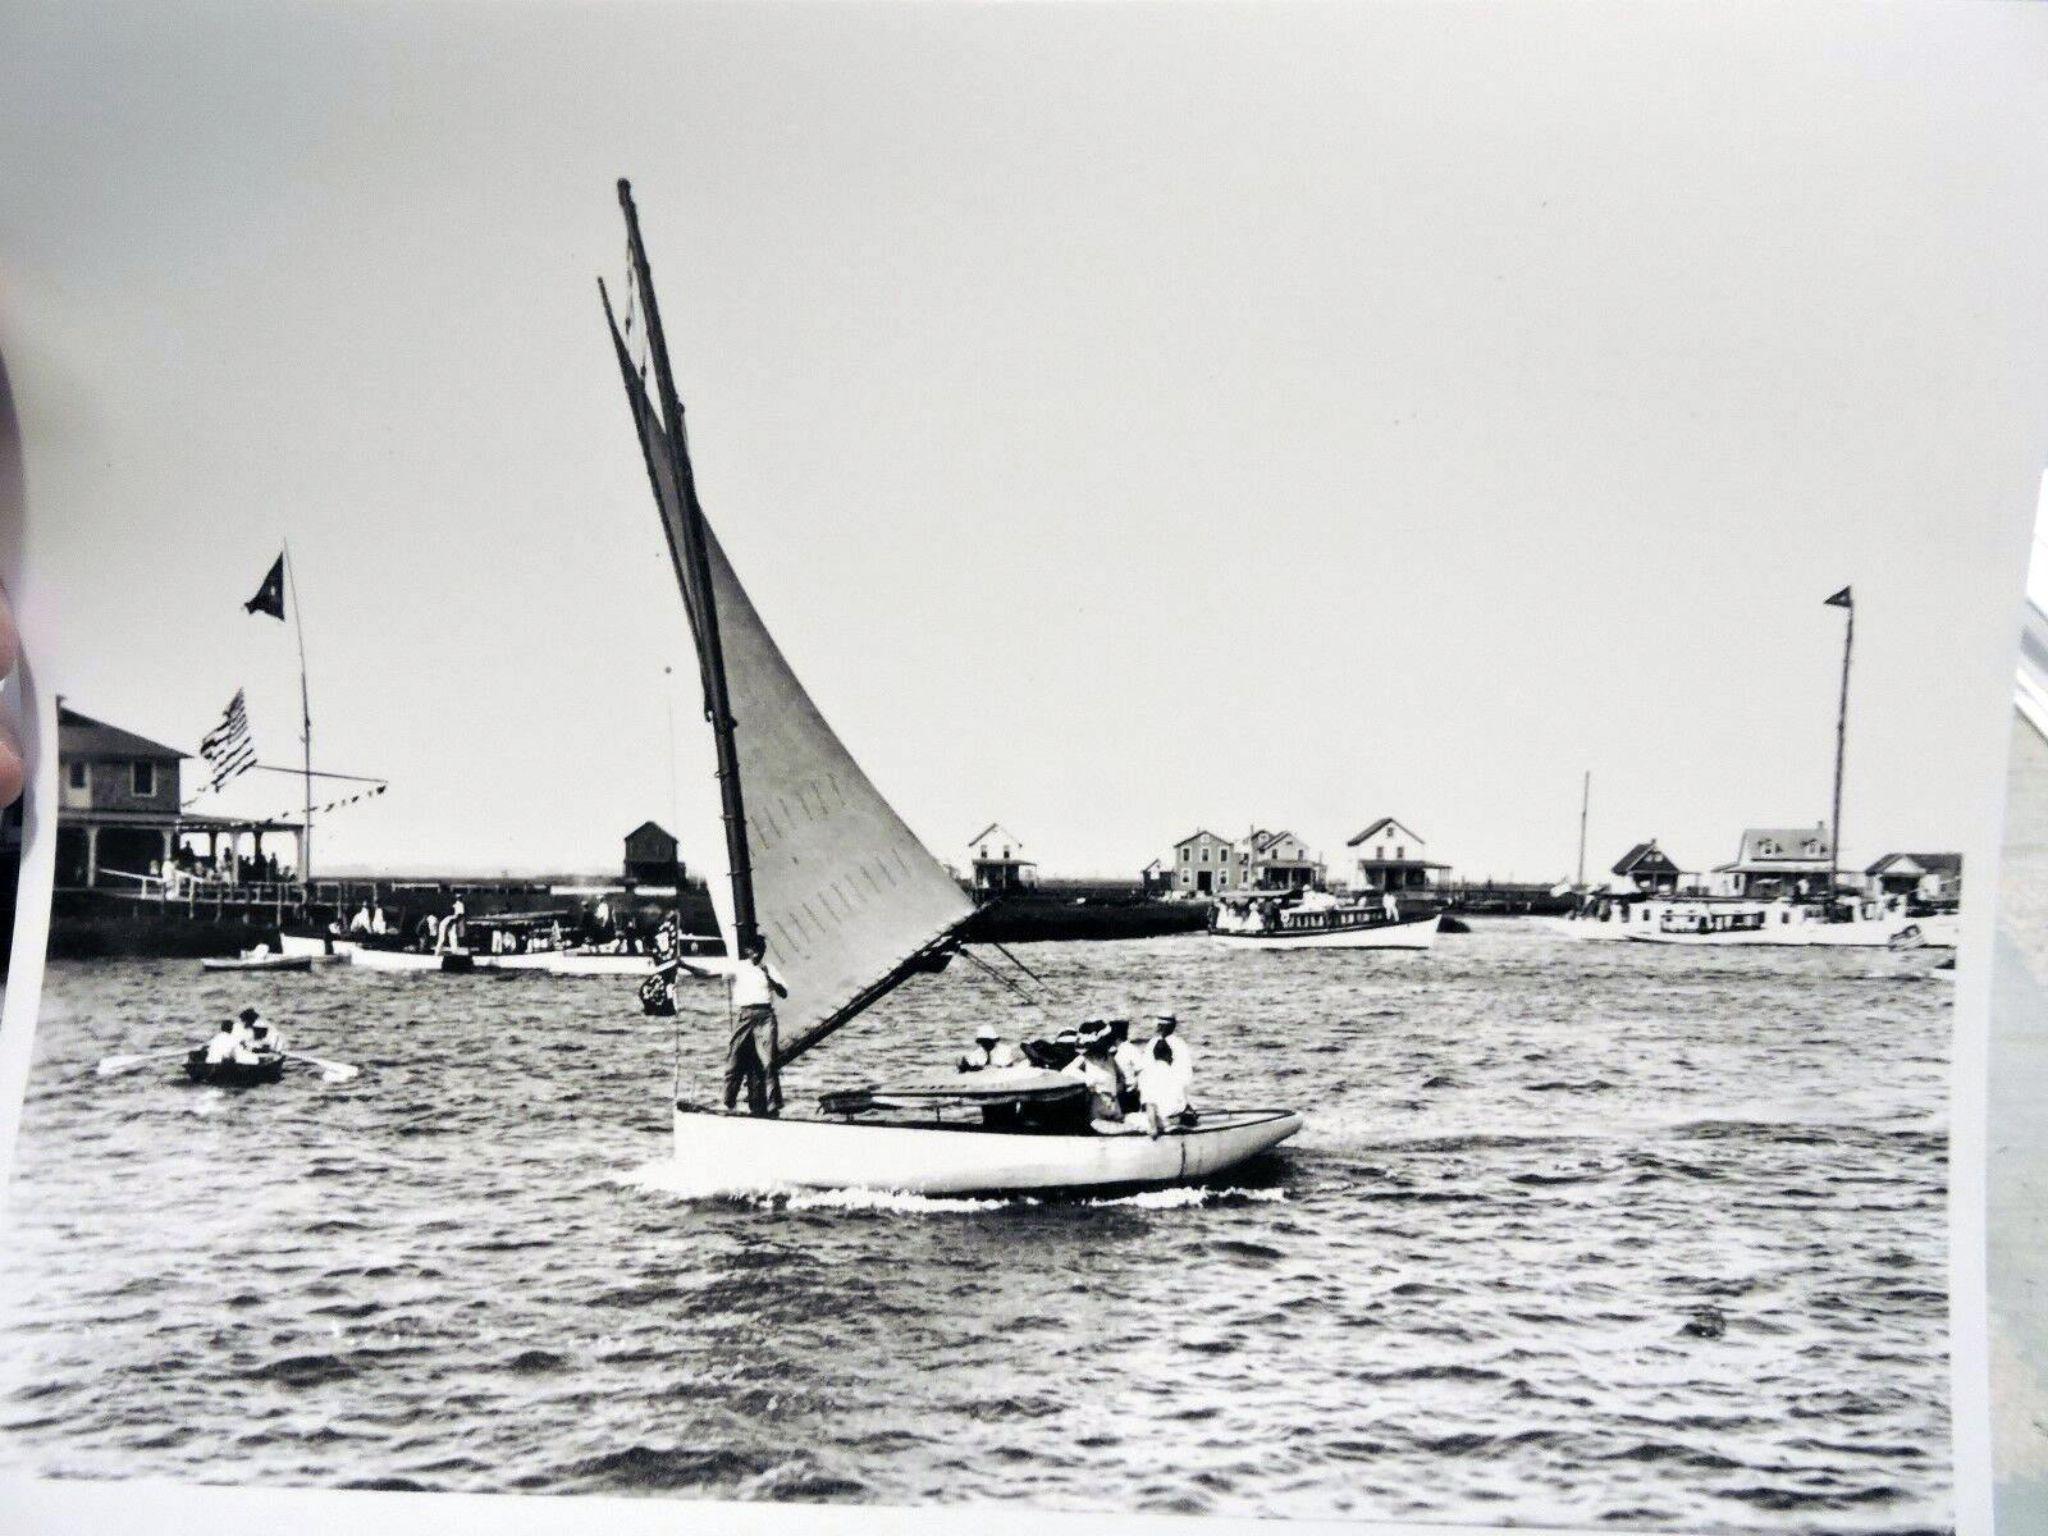 Pin by chazzyp on long island long island boat island